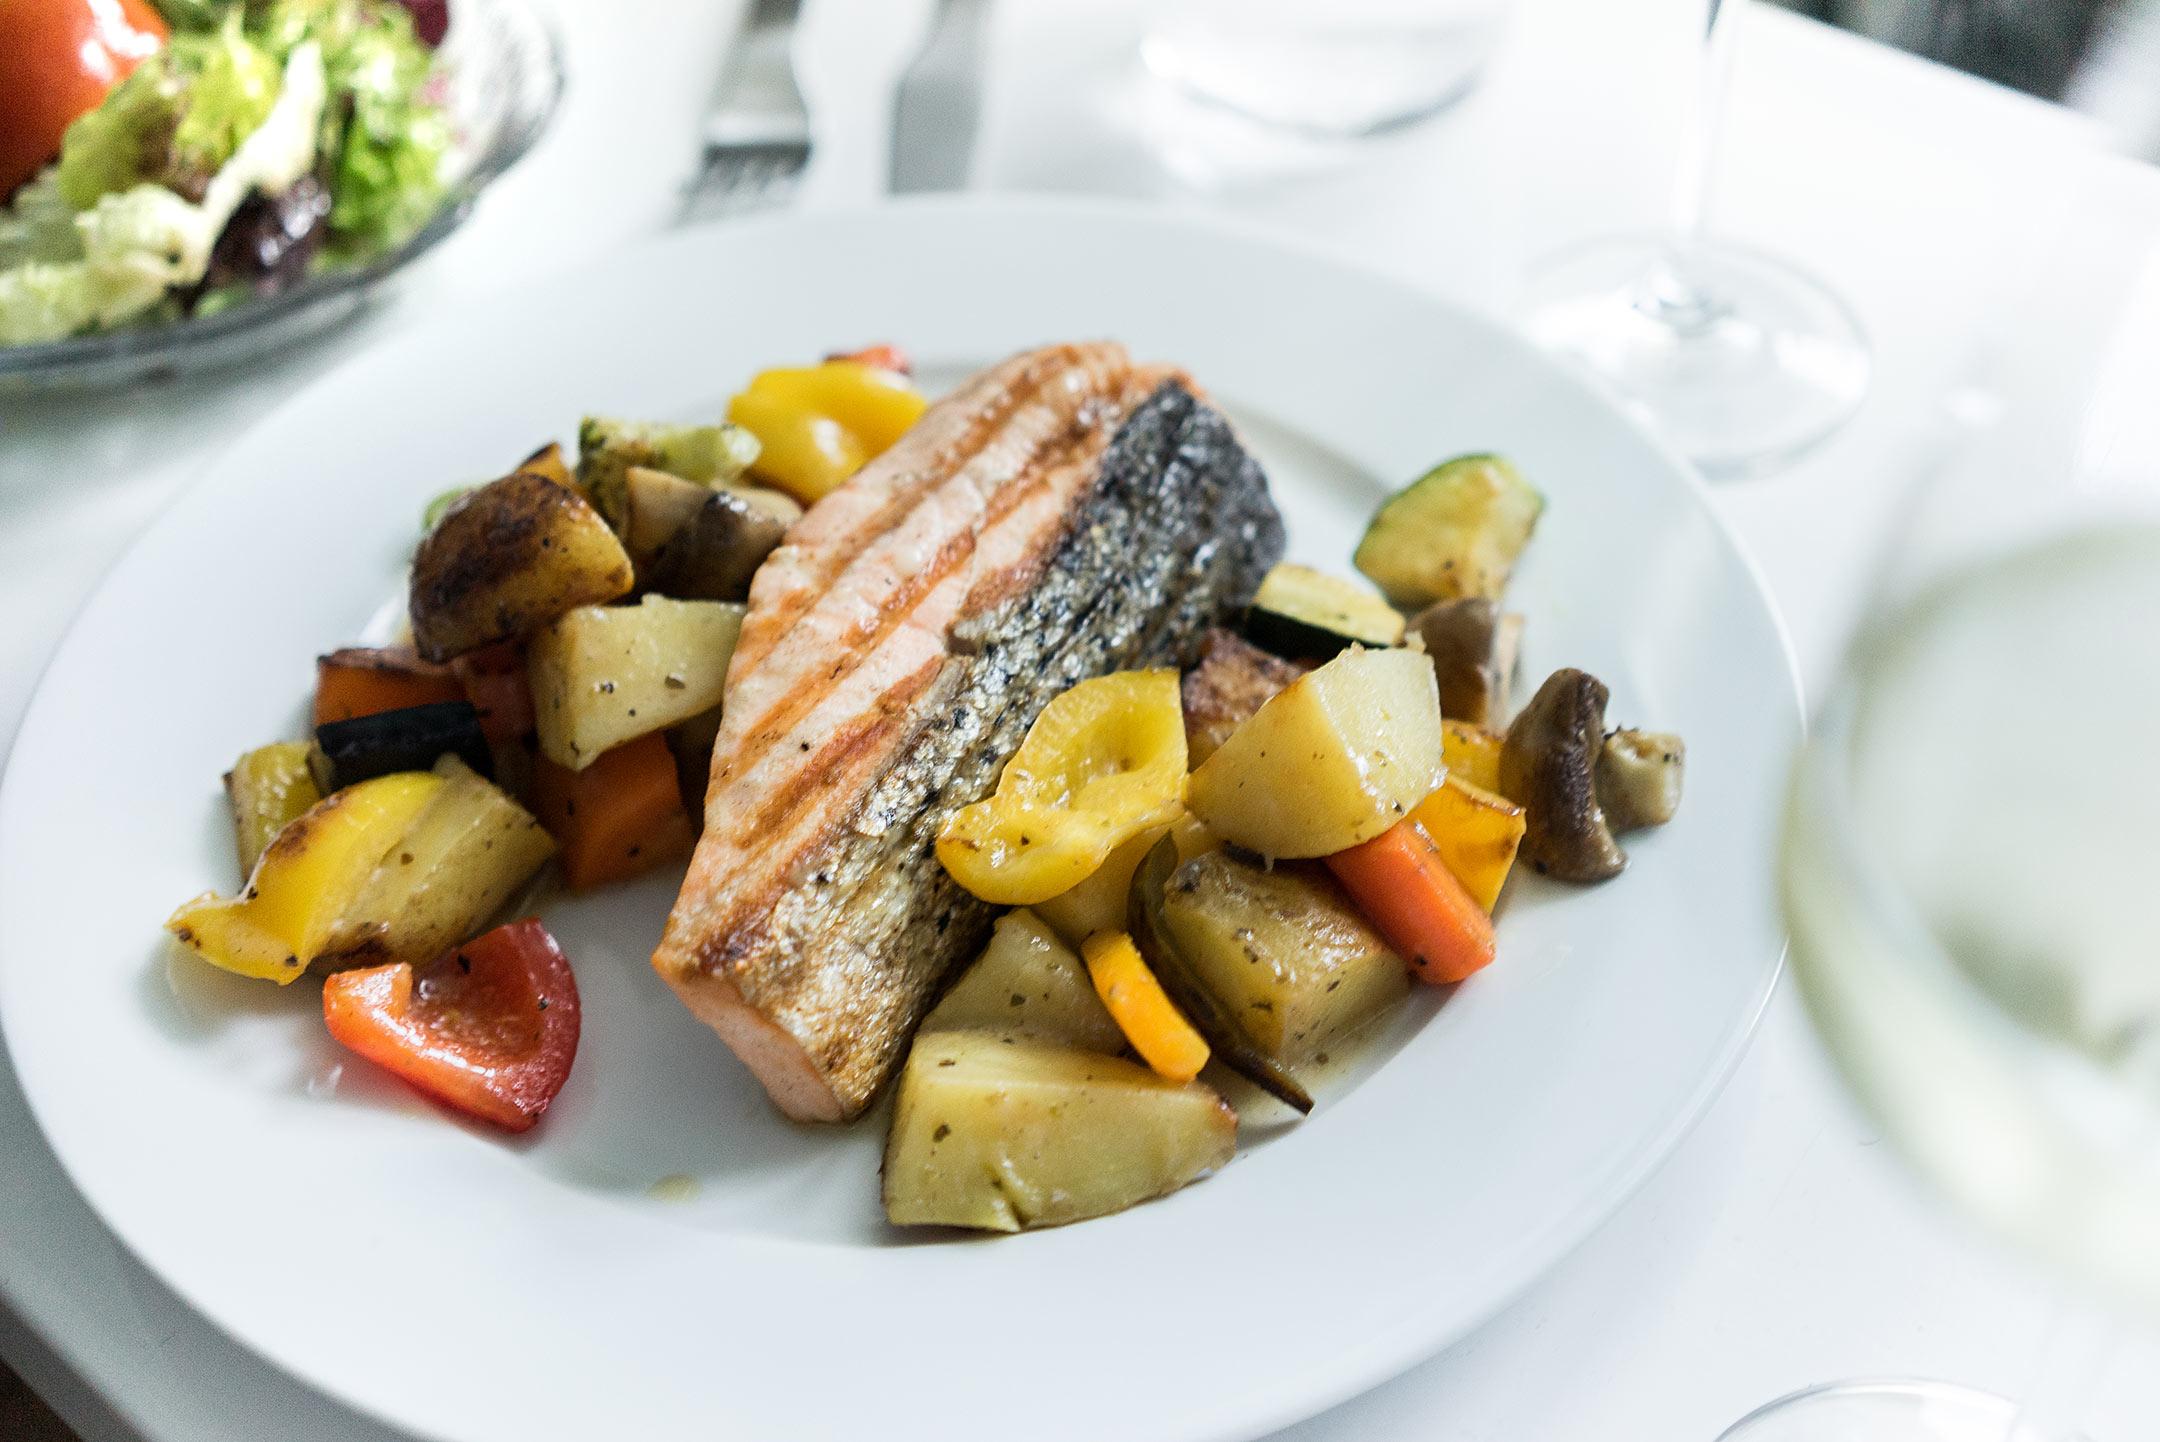 Lachsfilet Gemüse Düsseldorf Kostas Foodora Sunnyinga Lifestyle Blog